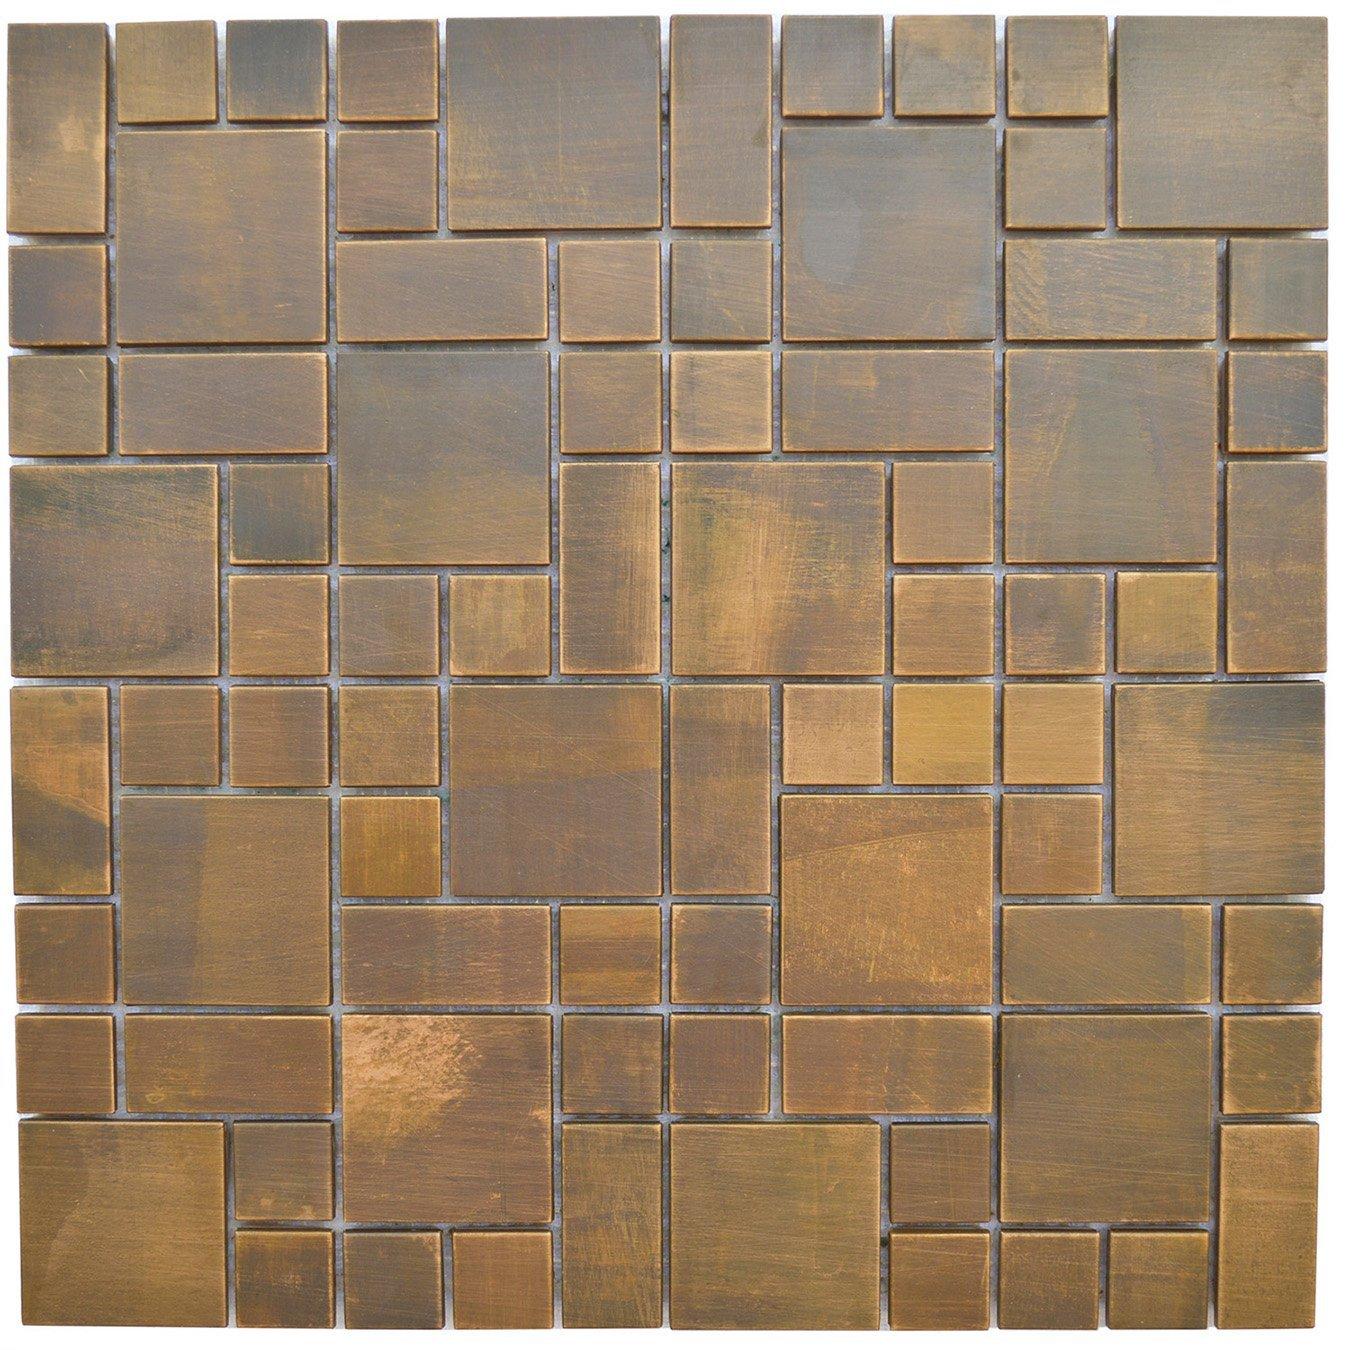 Get Quotations Copper Bath And Kitchen Backsplash Fireplace Surround Wall Decor Tile Eden Mosaic